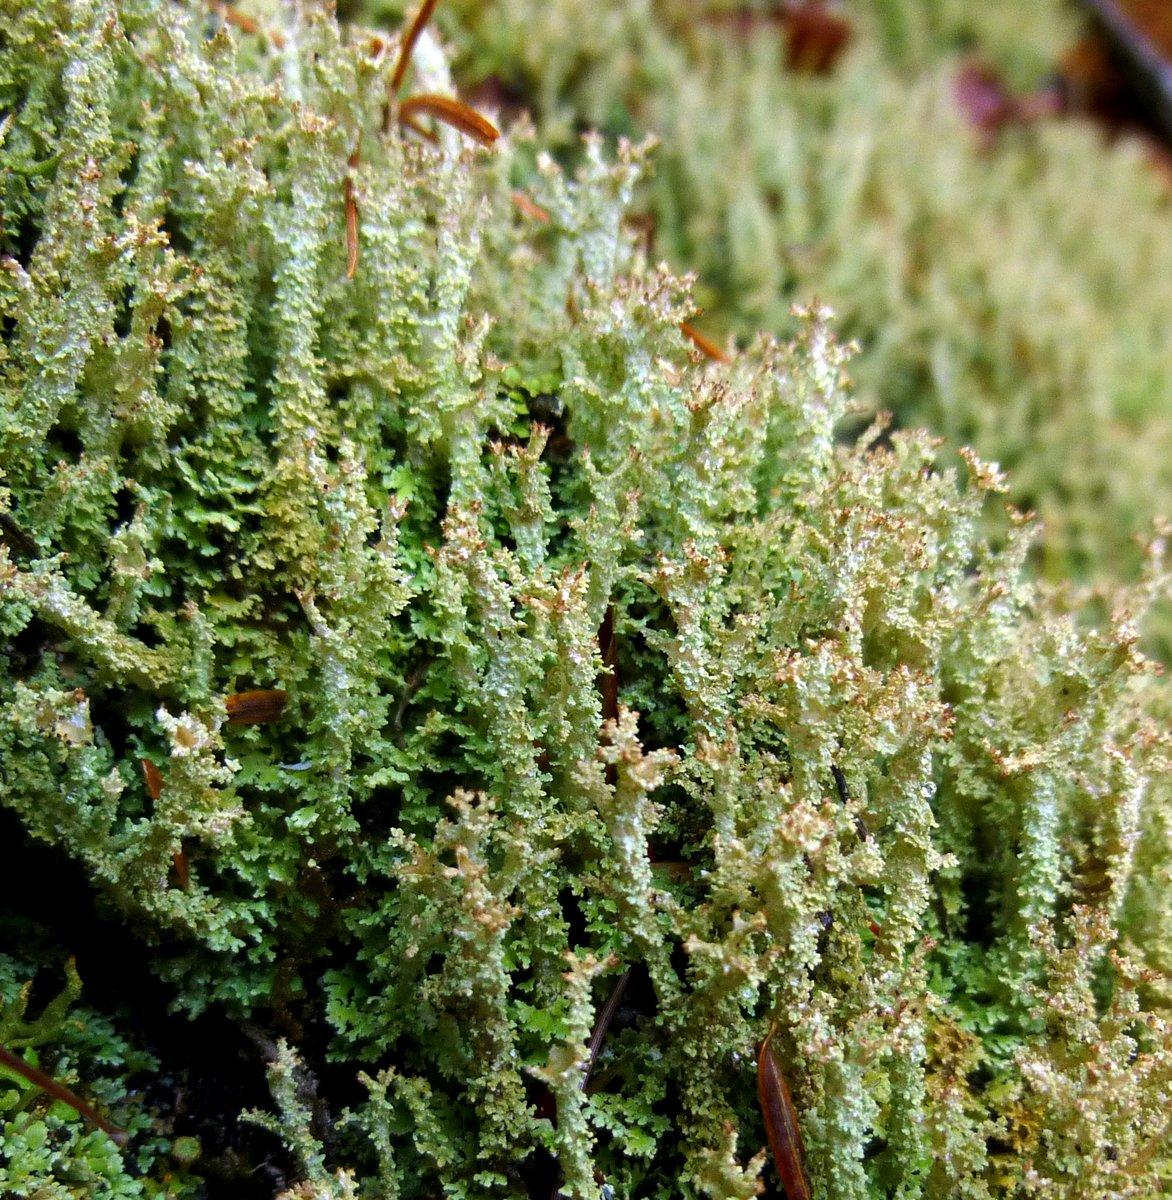 12. Rockfoam Lichen